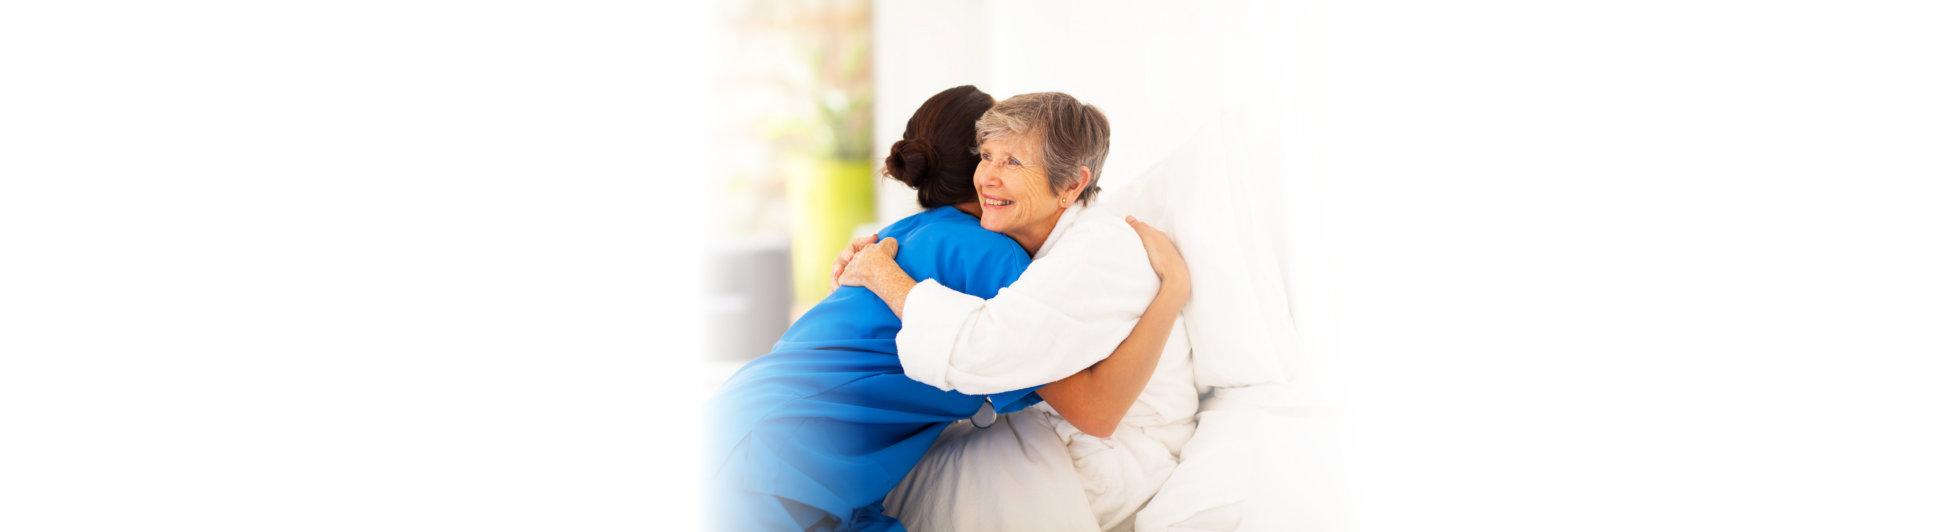 caregiver and elderwoman hug